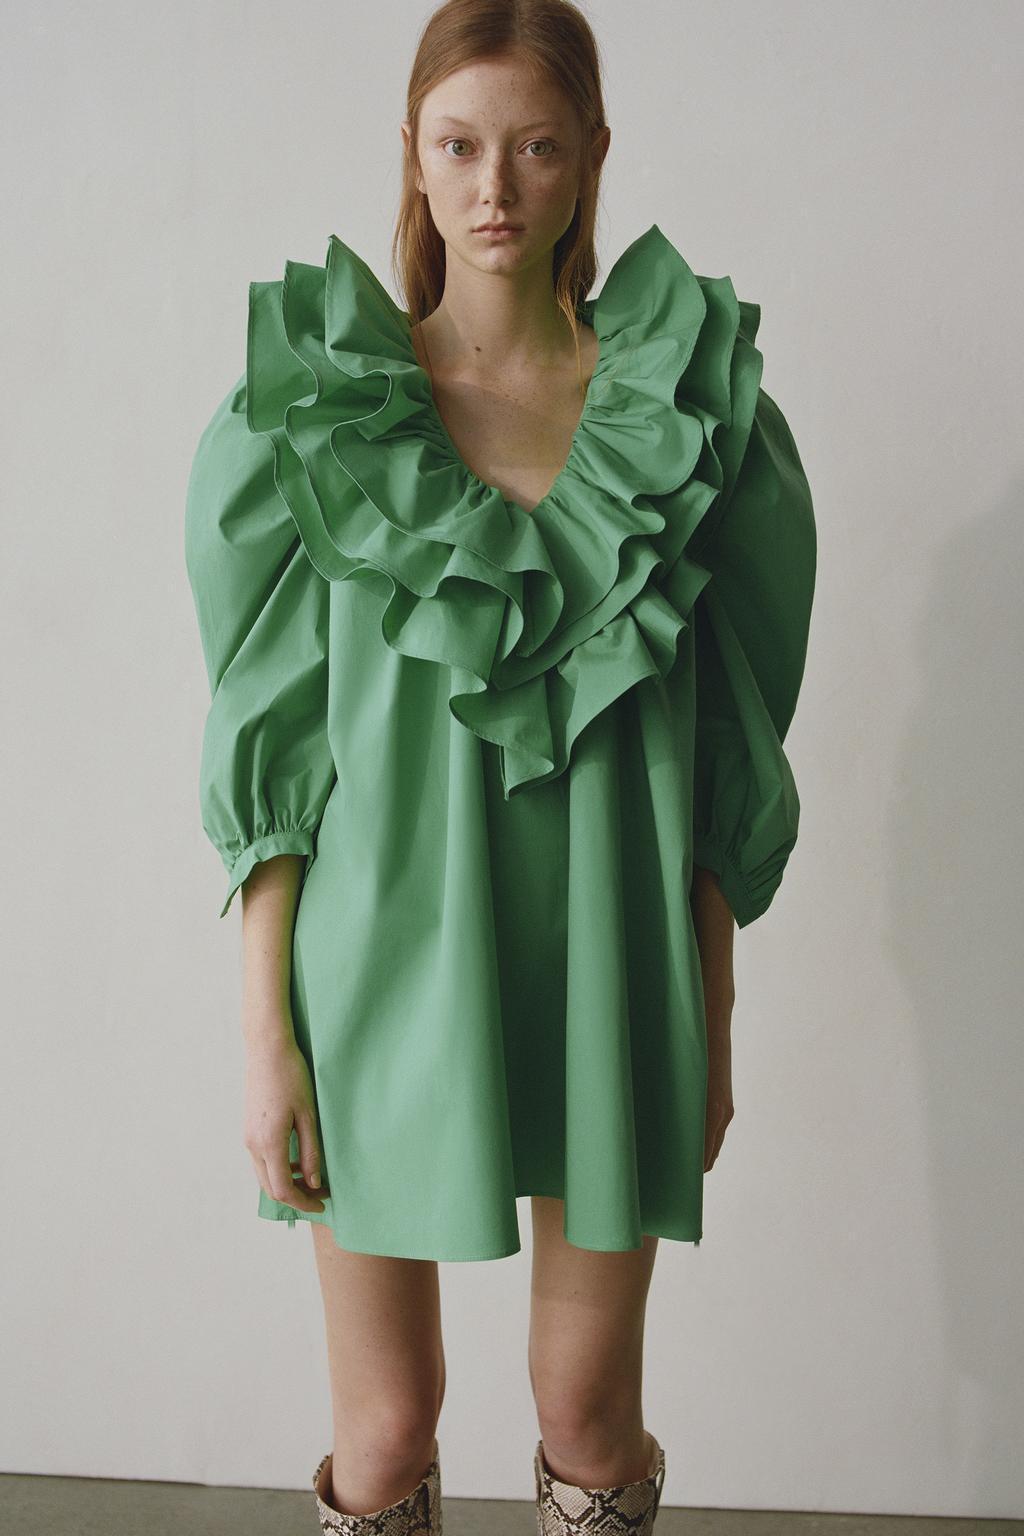 2020 New Spring Summer New Style European Laminated Decoration Poplin Female Dress Zaraing Vadiming Sheining Women Dress